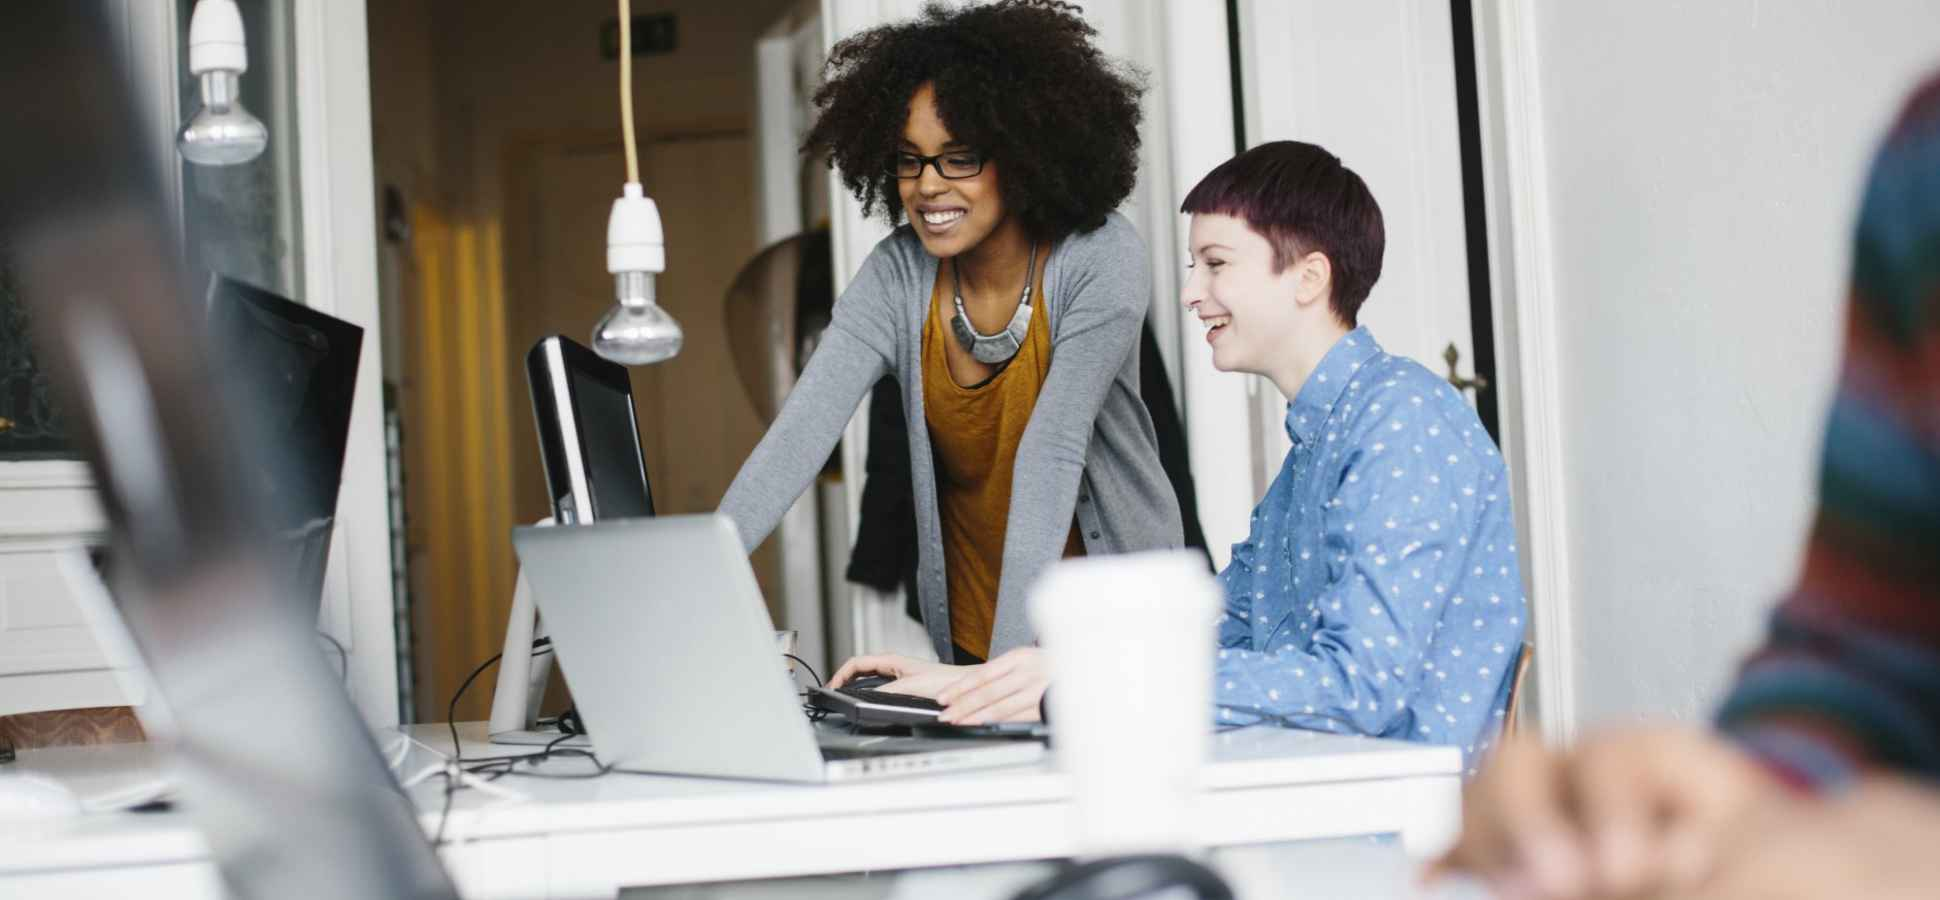 For Women Entrepreneurs Raising Money, It's Good to Be in New York or Los Angeles